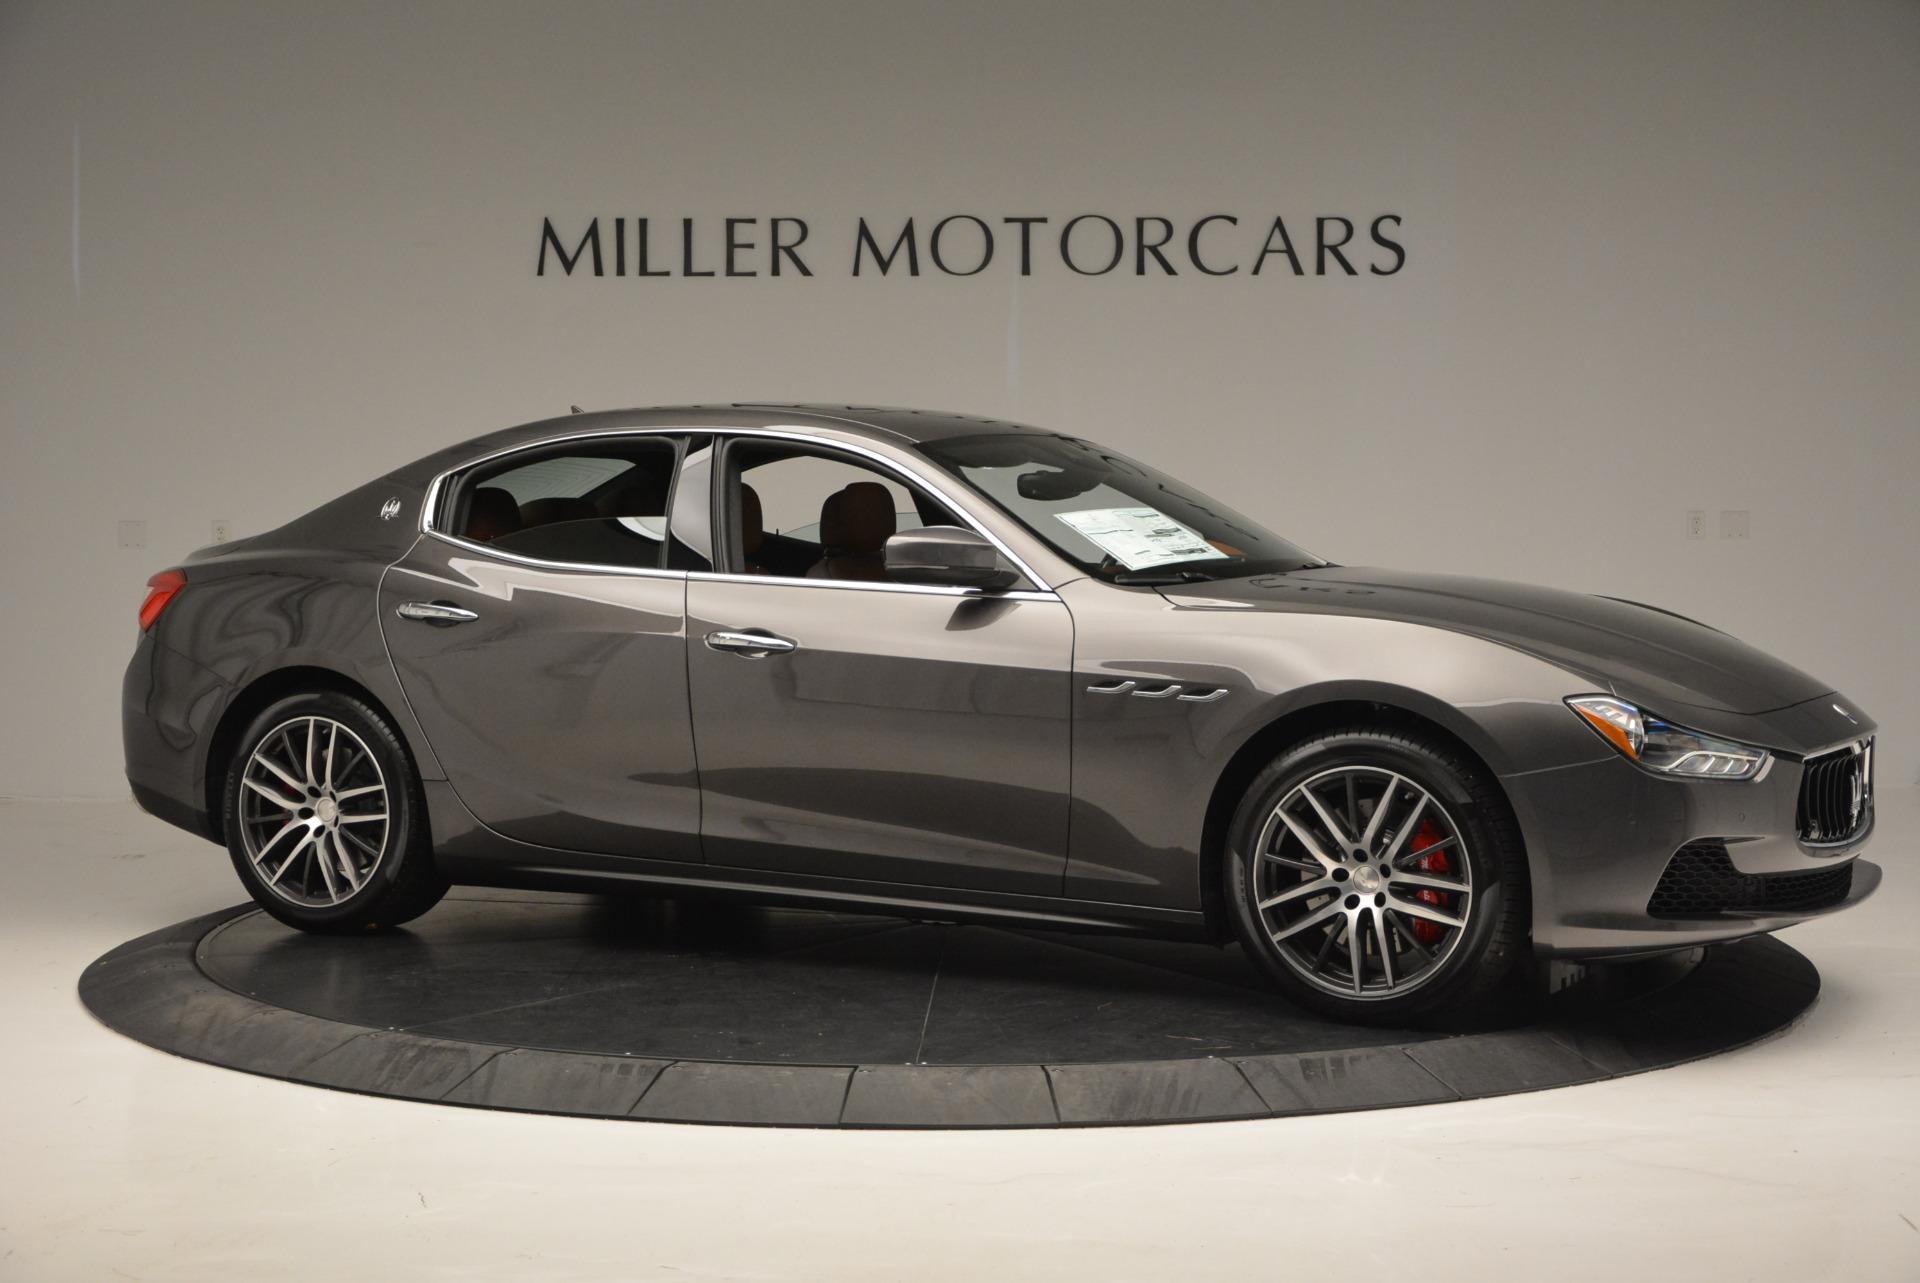 Used 2017 Maserati Ghibli S Q4  EX-LOANER For Sale In Greenwich, CT. Alfa Romeo of Greenwich, W311 565_p10